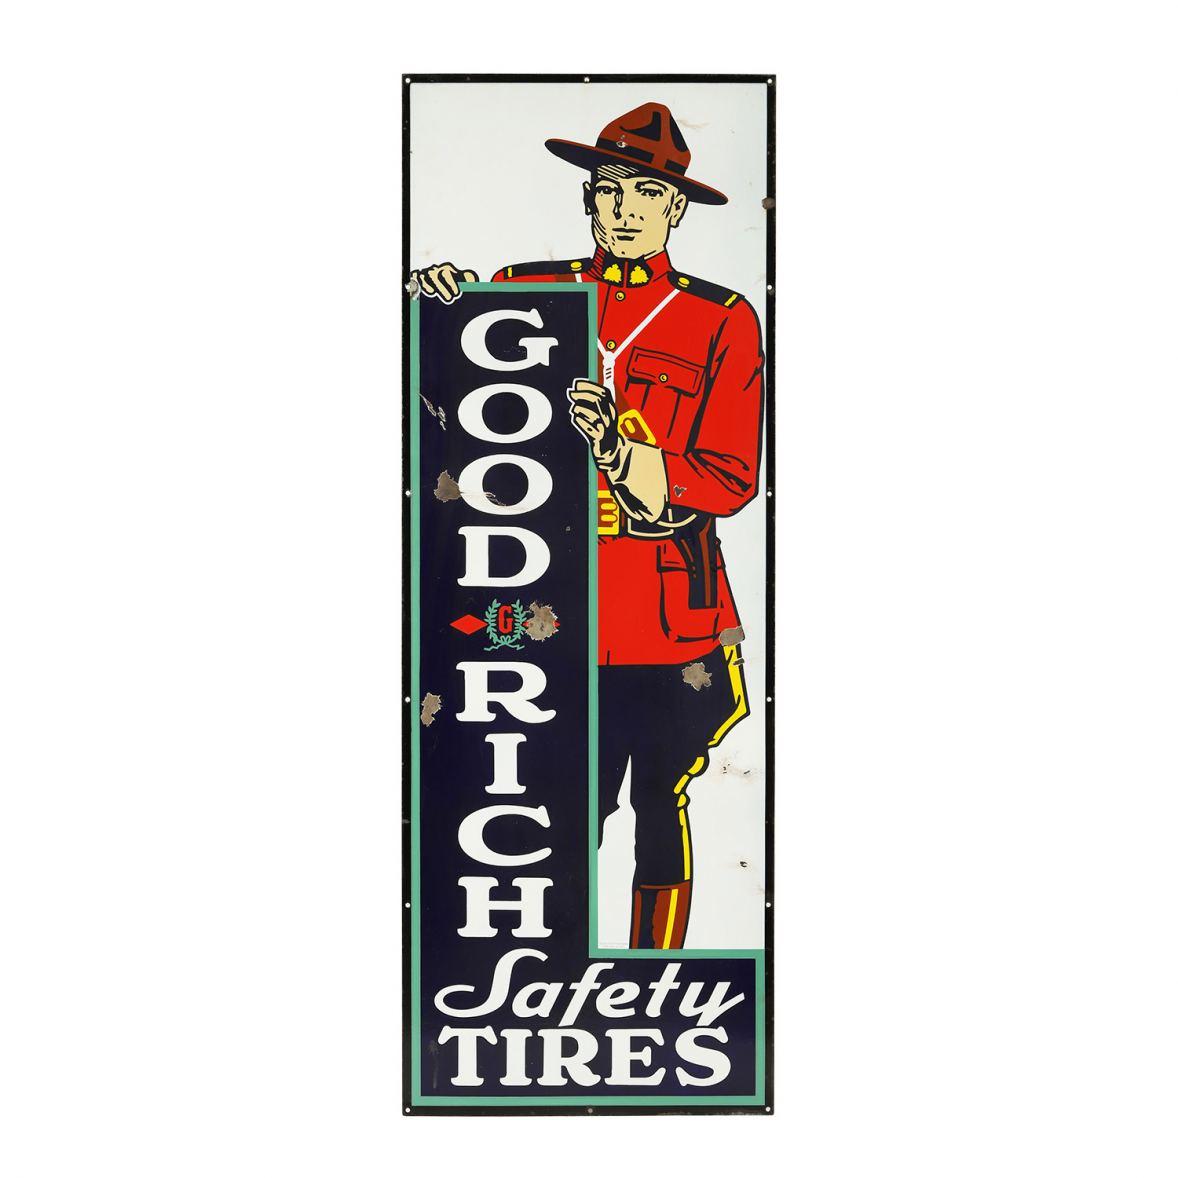 Canadian 1930s Goodrich Tires porcelain sign.